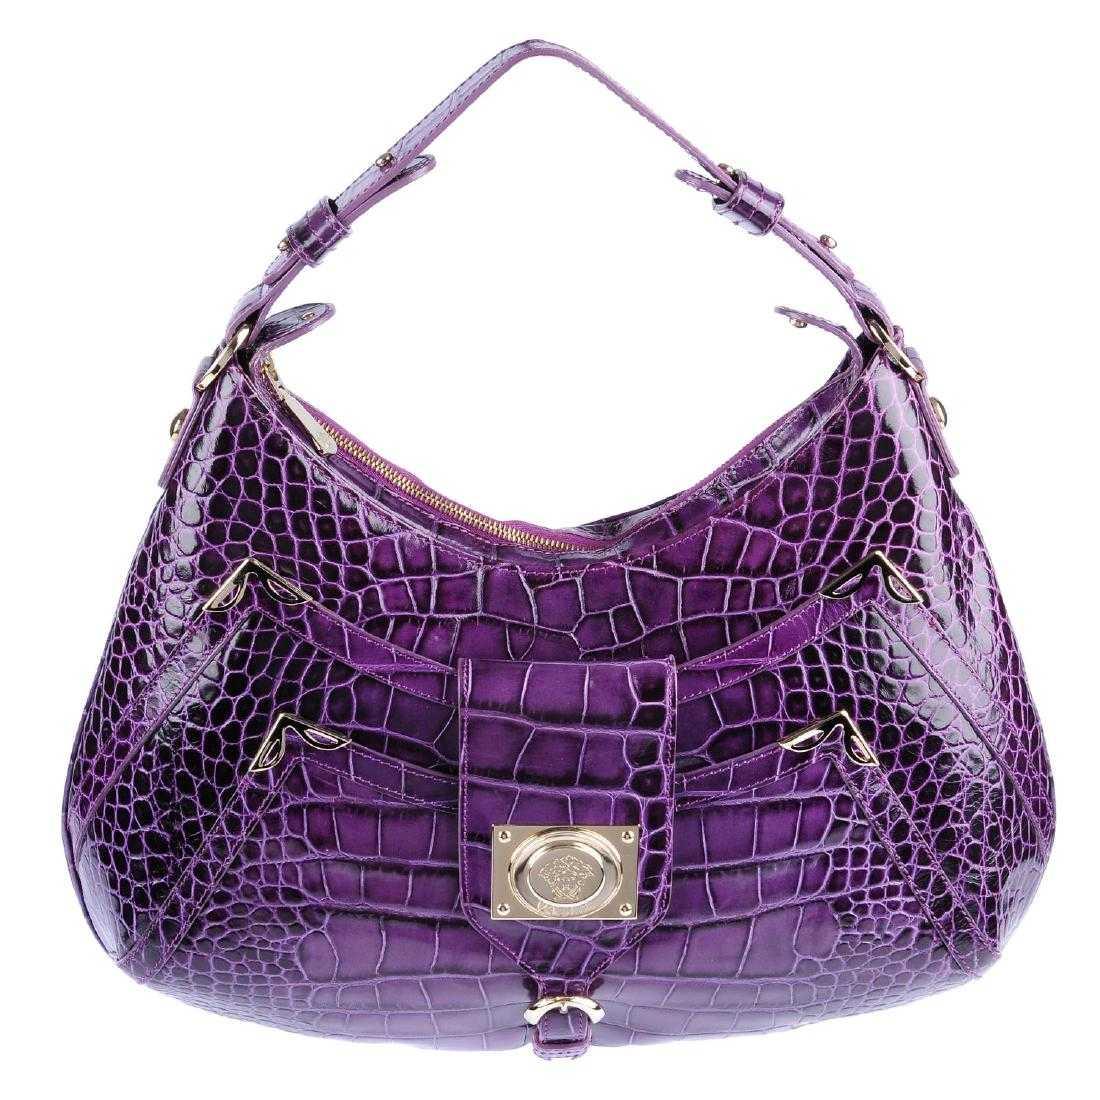 678d7f34f2 VERSACE - an embossed crocodile leather handbag.